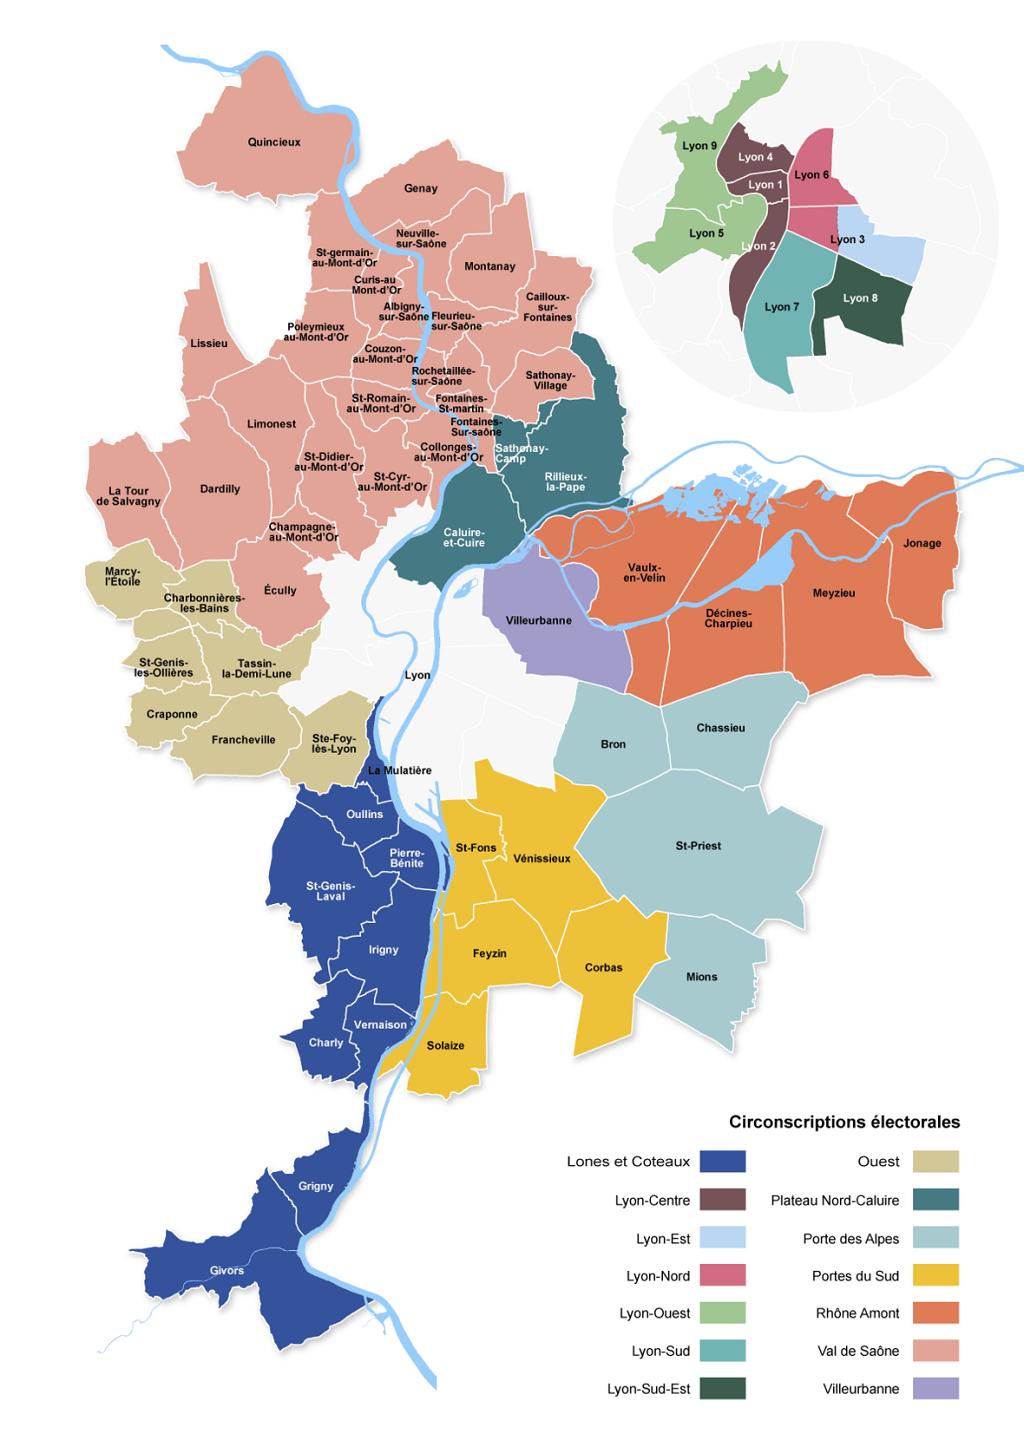 csm_circonscriptions_metropolitaines-2020__01969afbf9